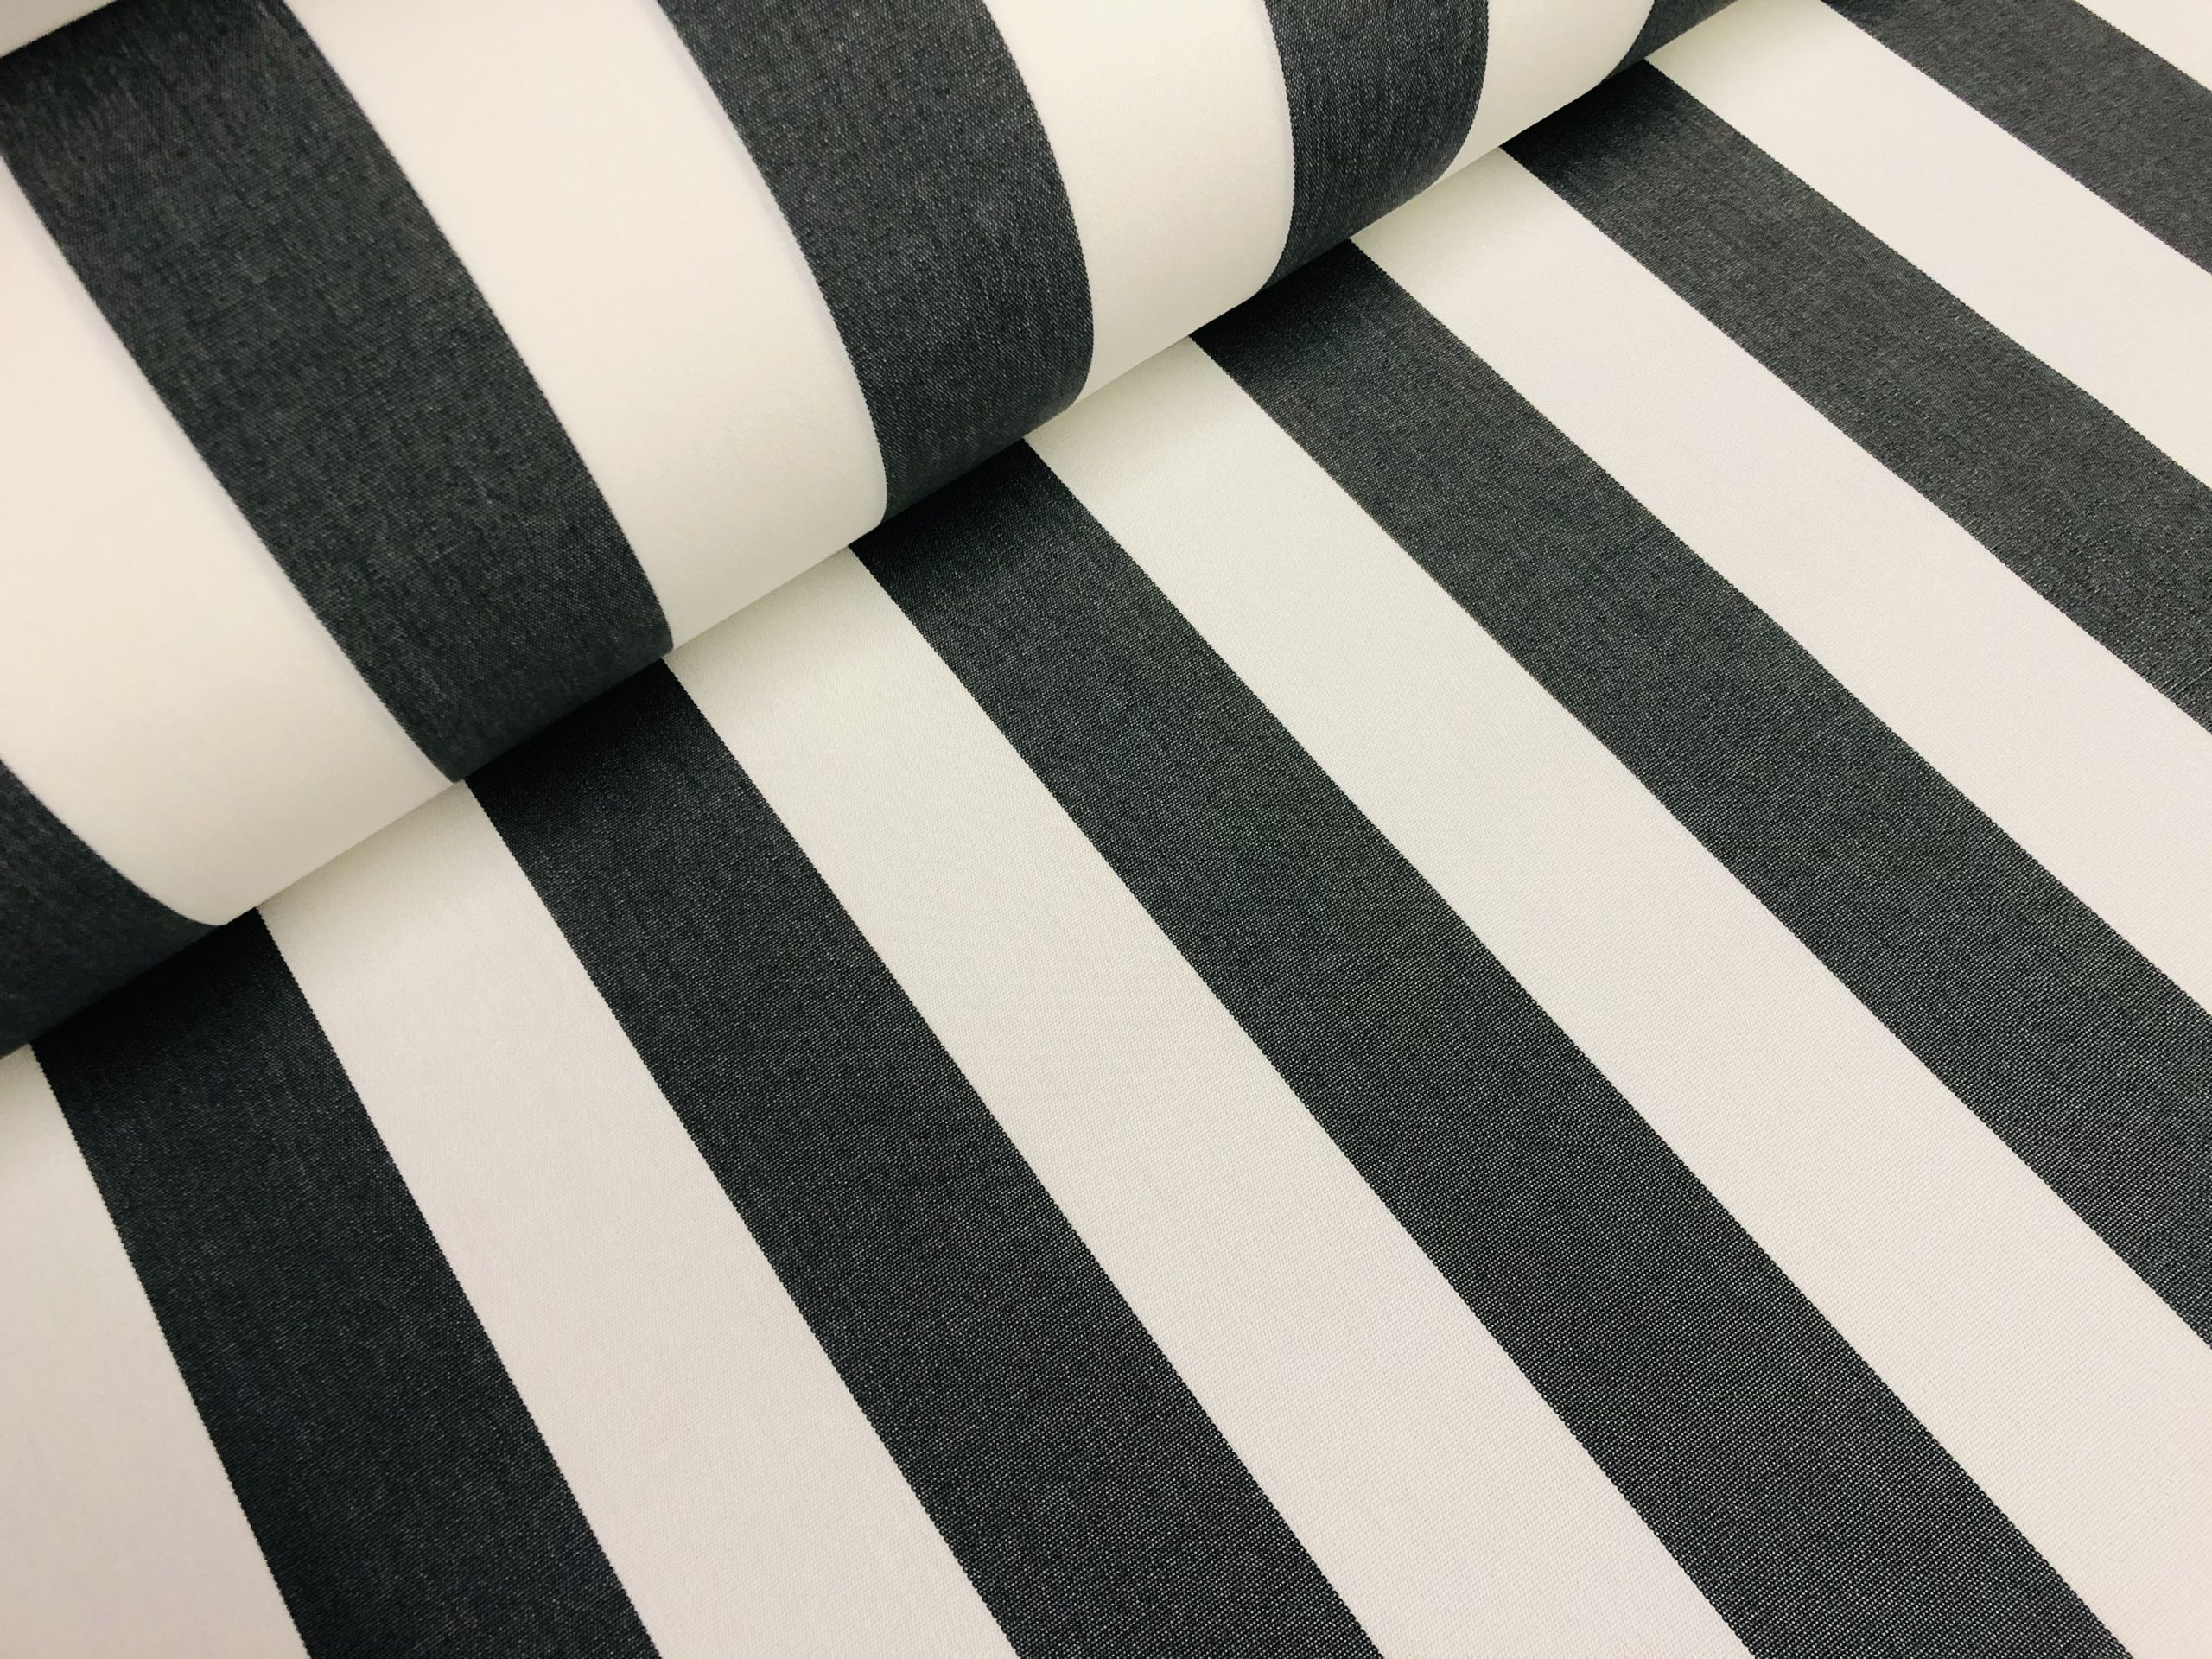 "Black & White Striped DRALON Outdoor Fabric Acrylic Teflon Waterproof Upholstery Material For Cushion Gazebo Beach – 63""/160cm Wide"